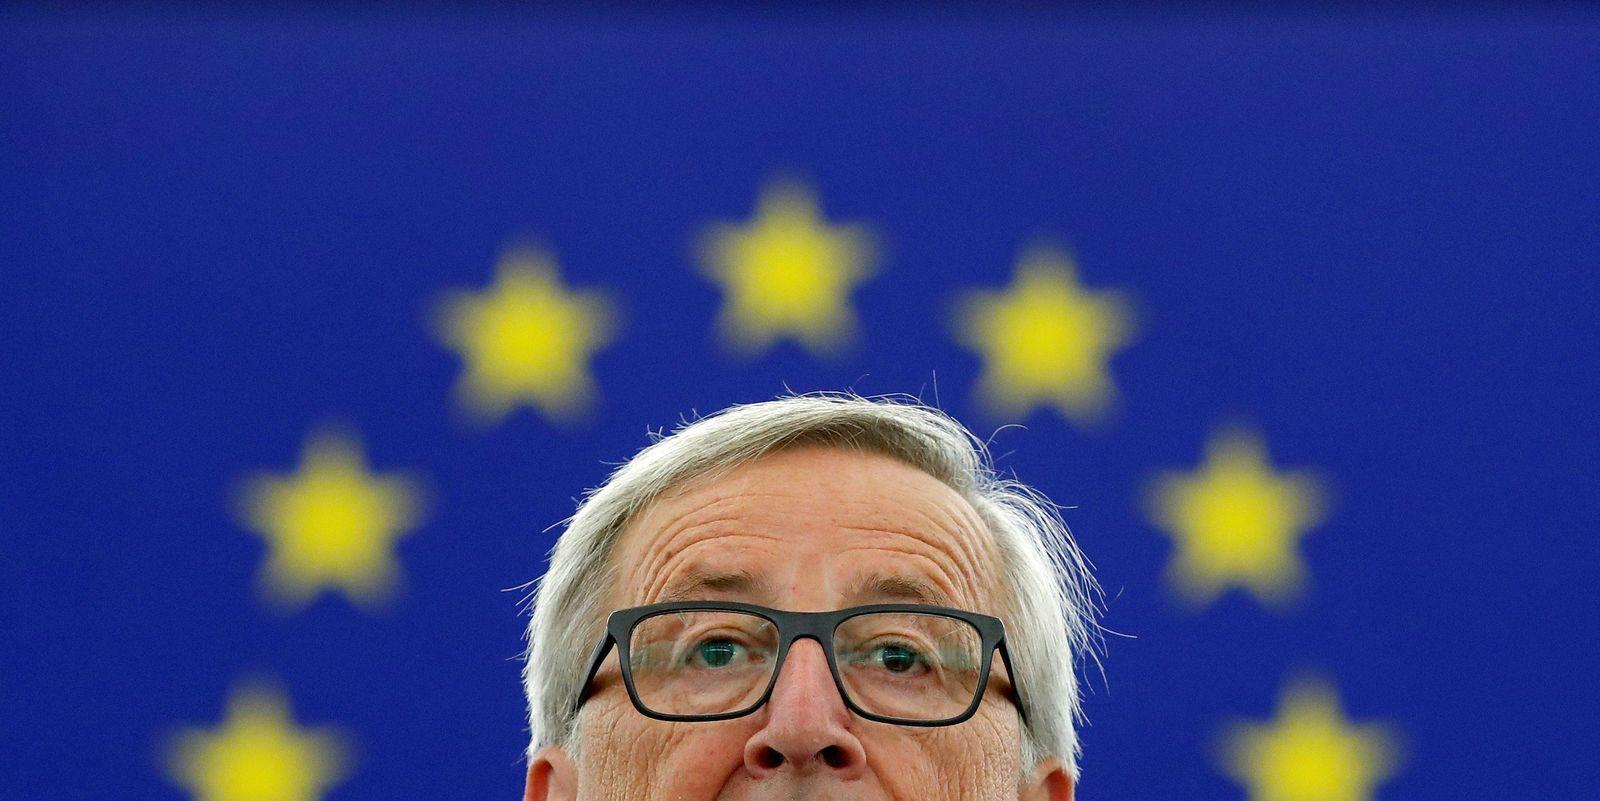 EU-JUNCKER/